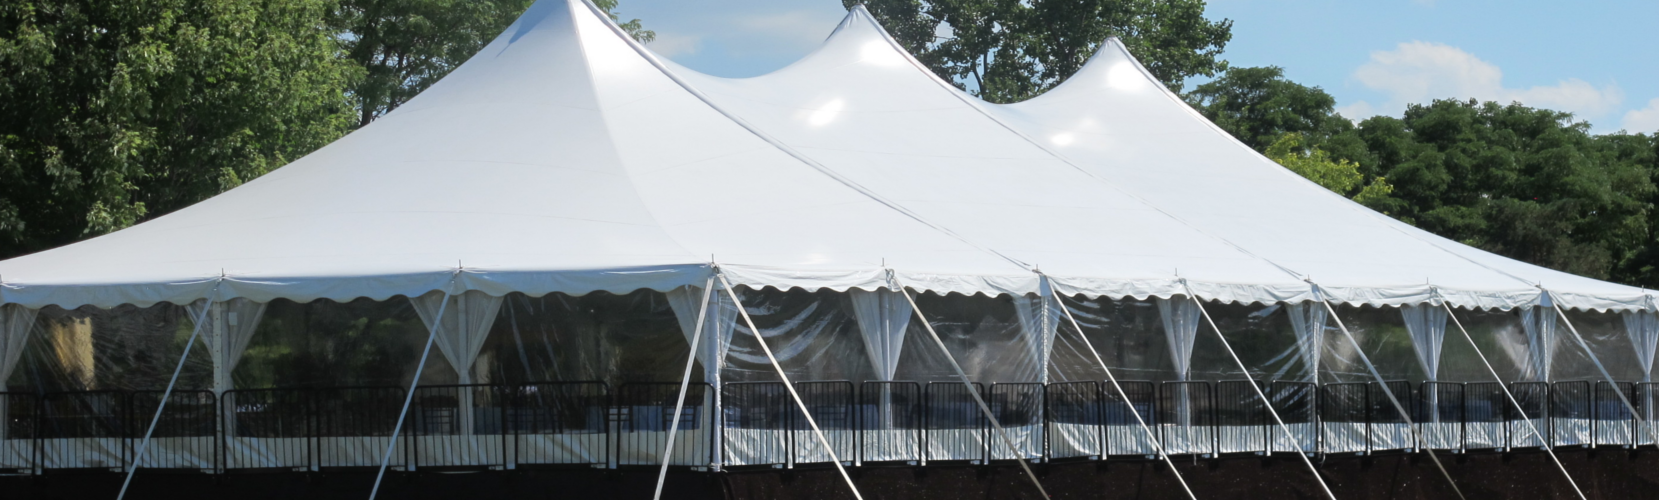 Events Equipment